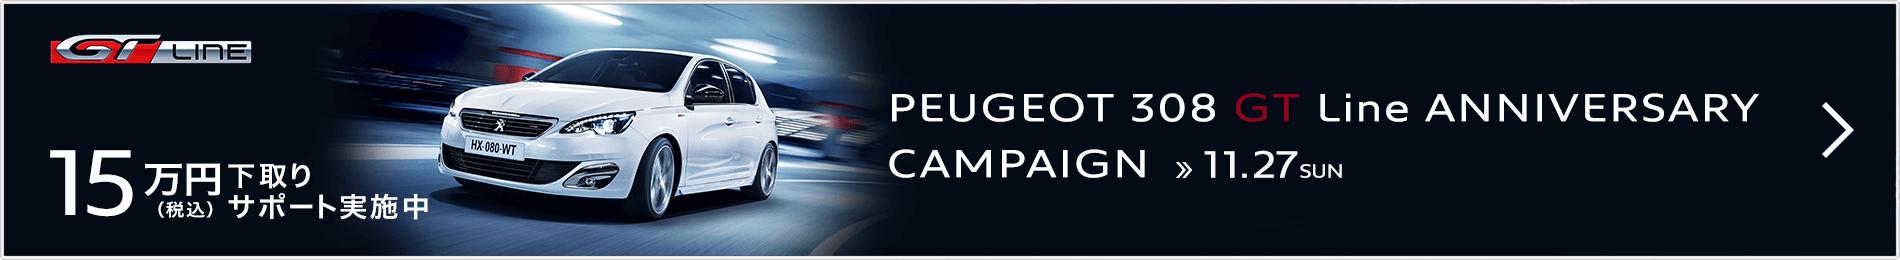 PEUGEOT 308 GT Line ANNIVERSARY CAMPAIGN » 11.27 SUN 詳しくはこちら>